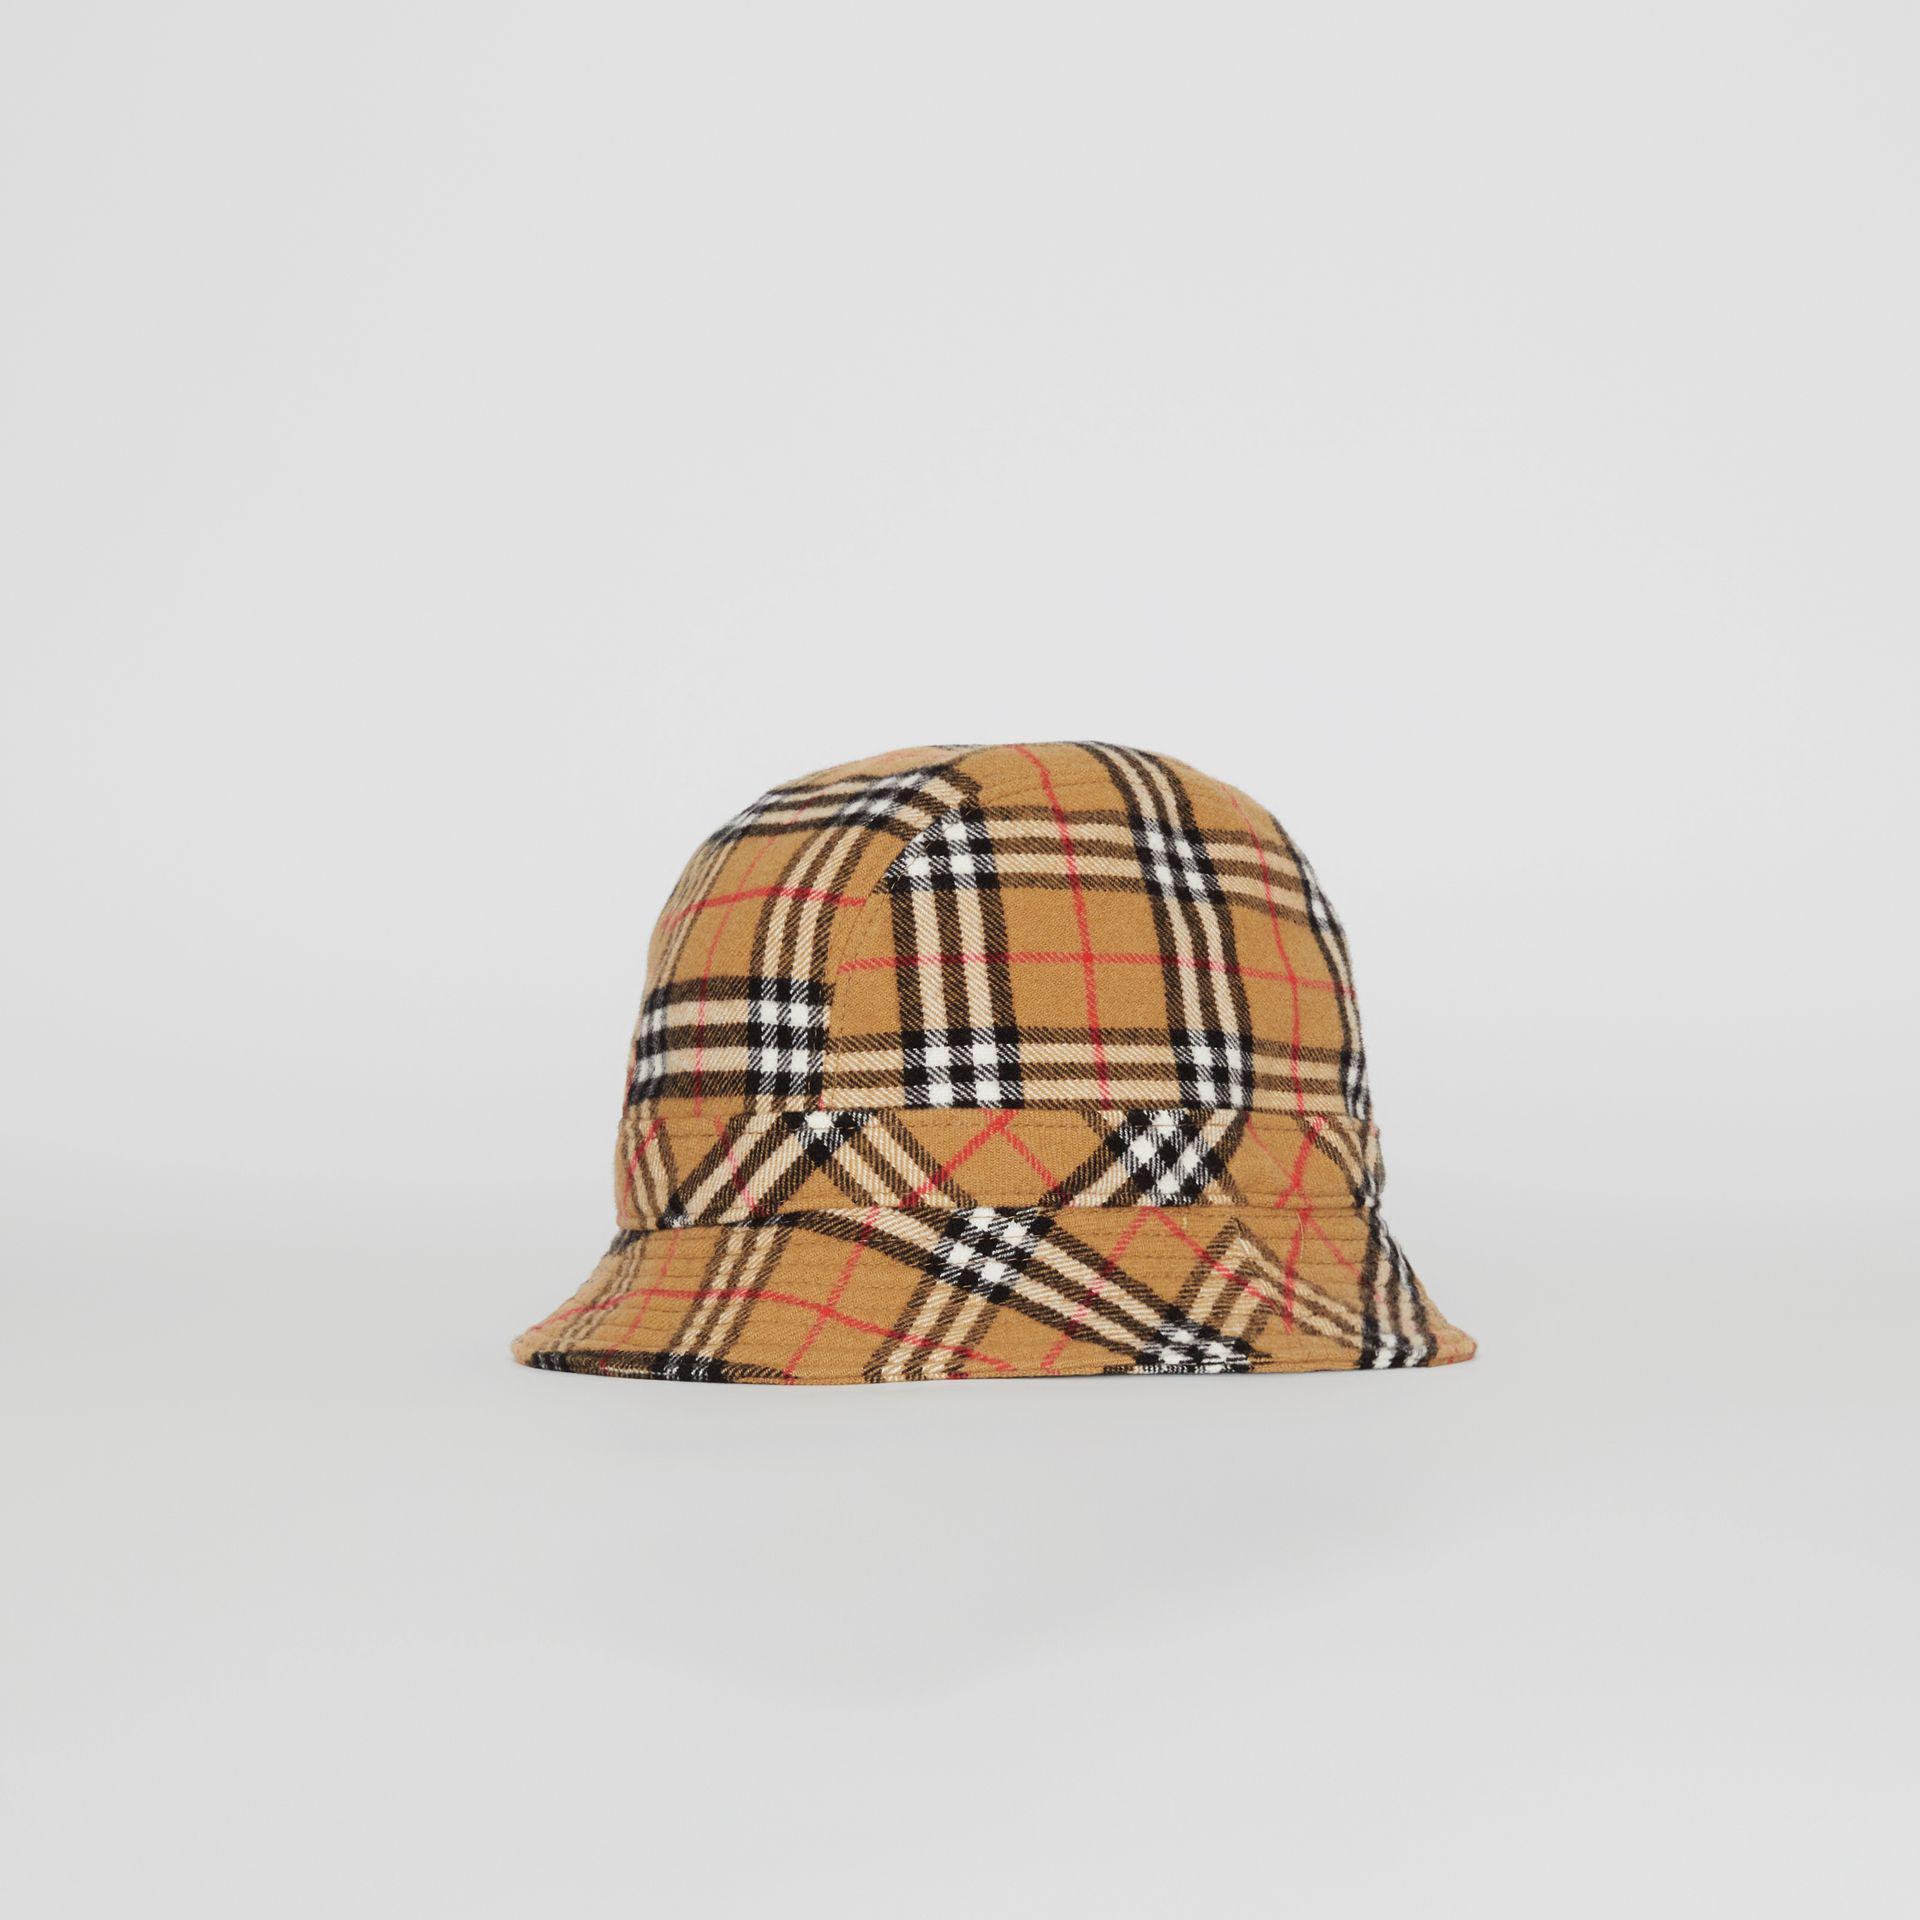 Lyst - Burberry Gosha X Check Flannel Bucket Hat 1d36a541283